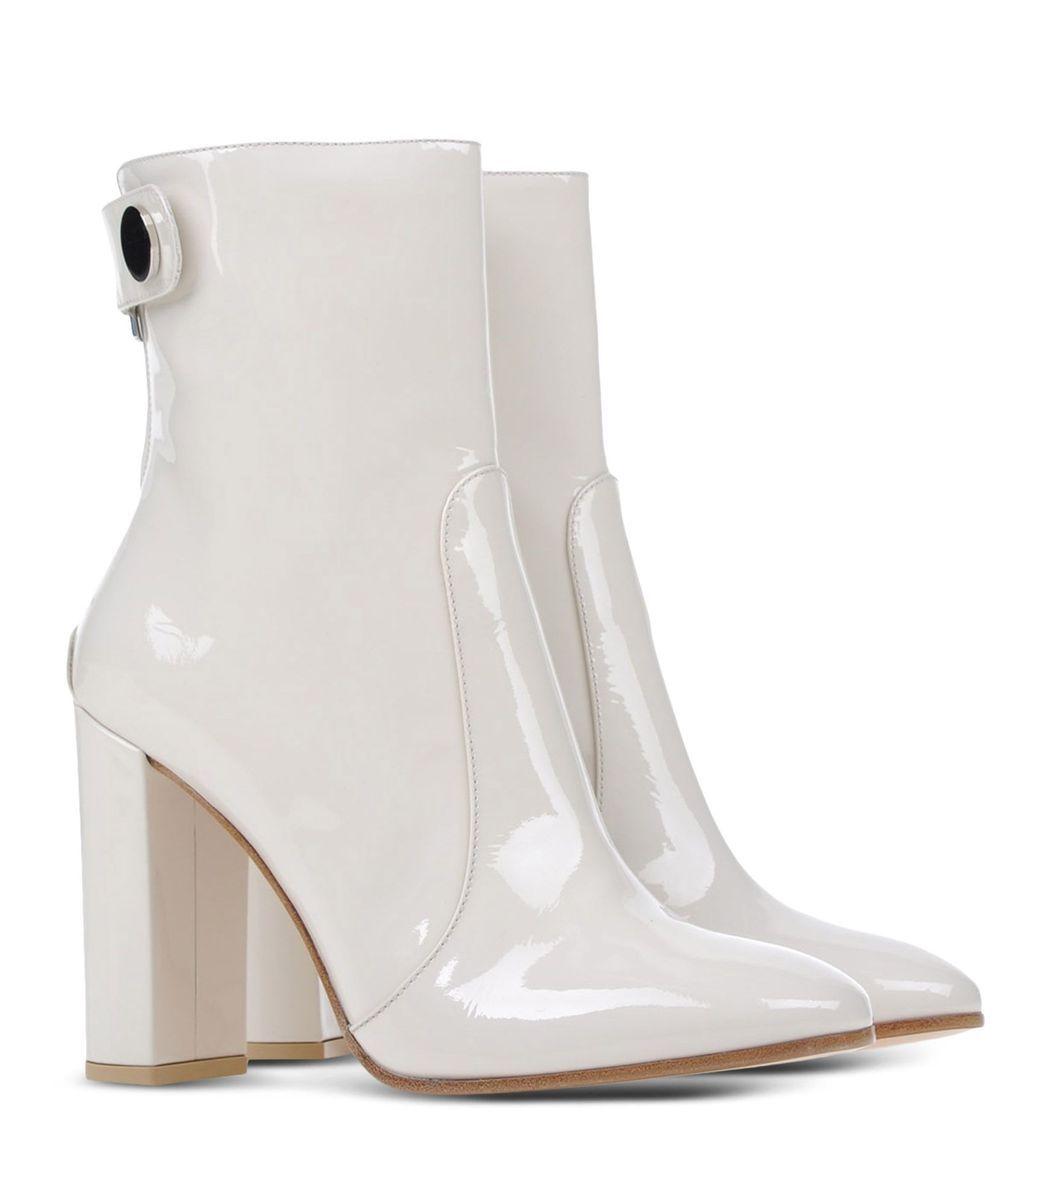 df3ec6cbc262 ShopBazaar Gianvito Rossi White Patent Leather Ankle Boot FRONT ...